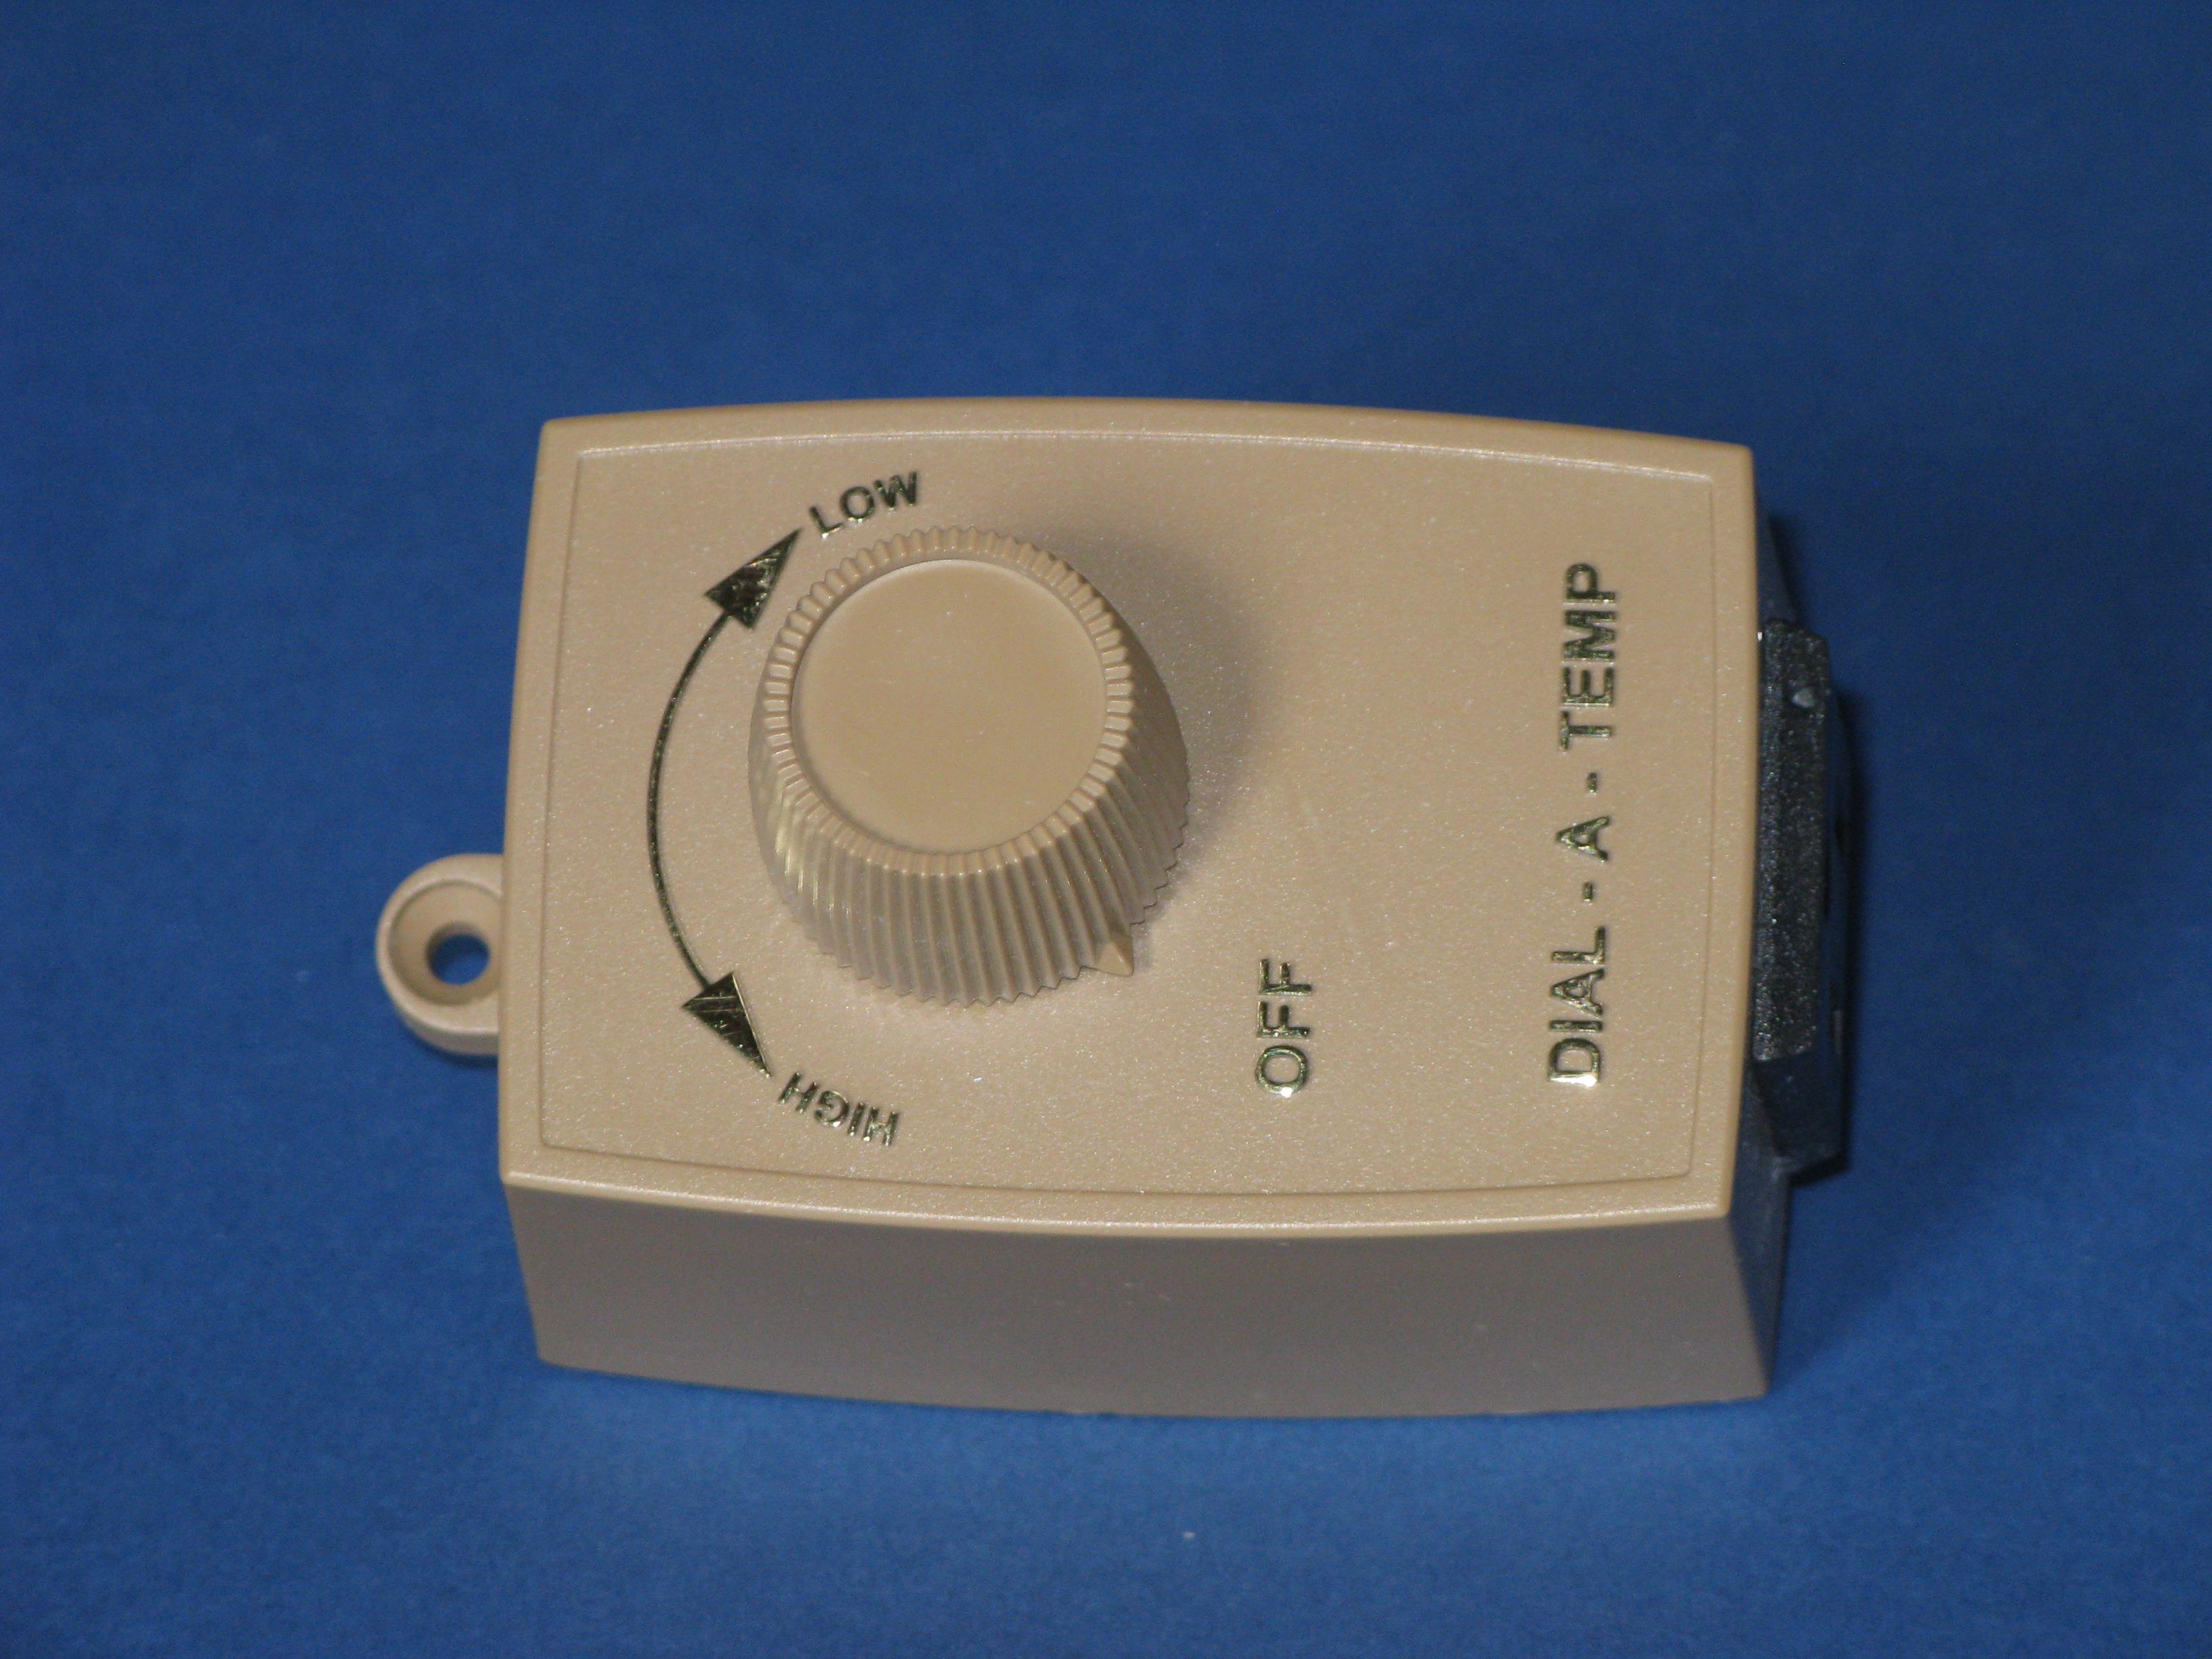 Deluxe Speed Control